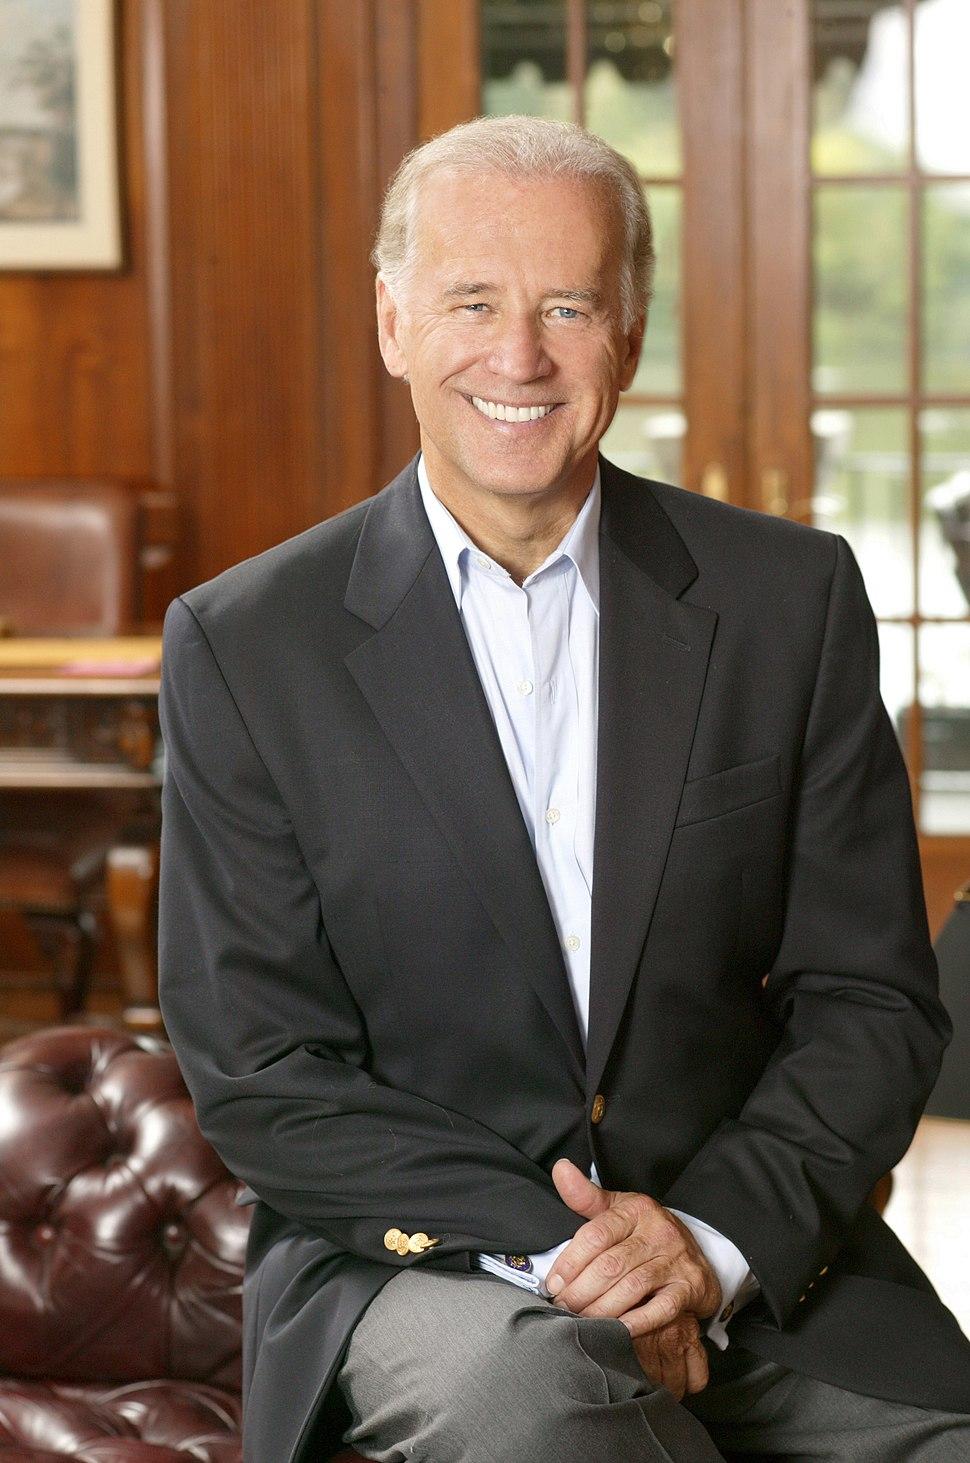 Joe Biden, official photo portrait 2